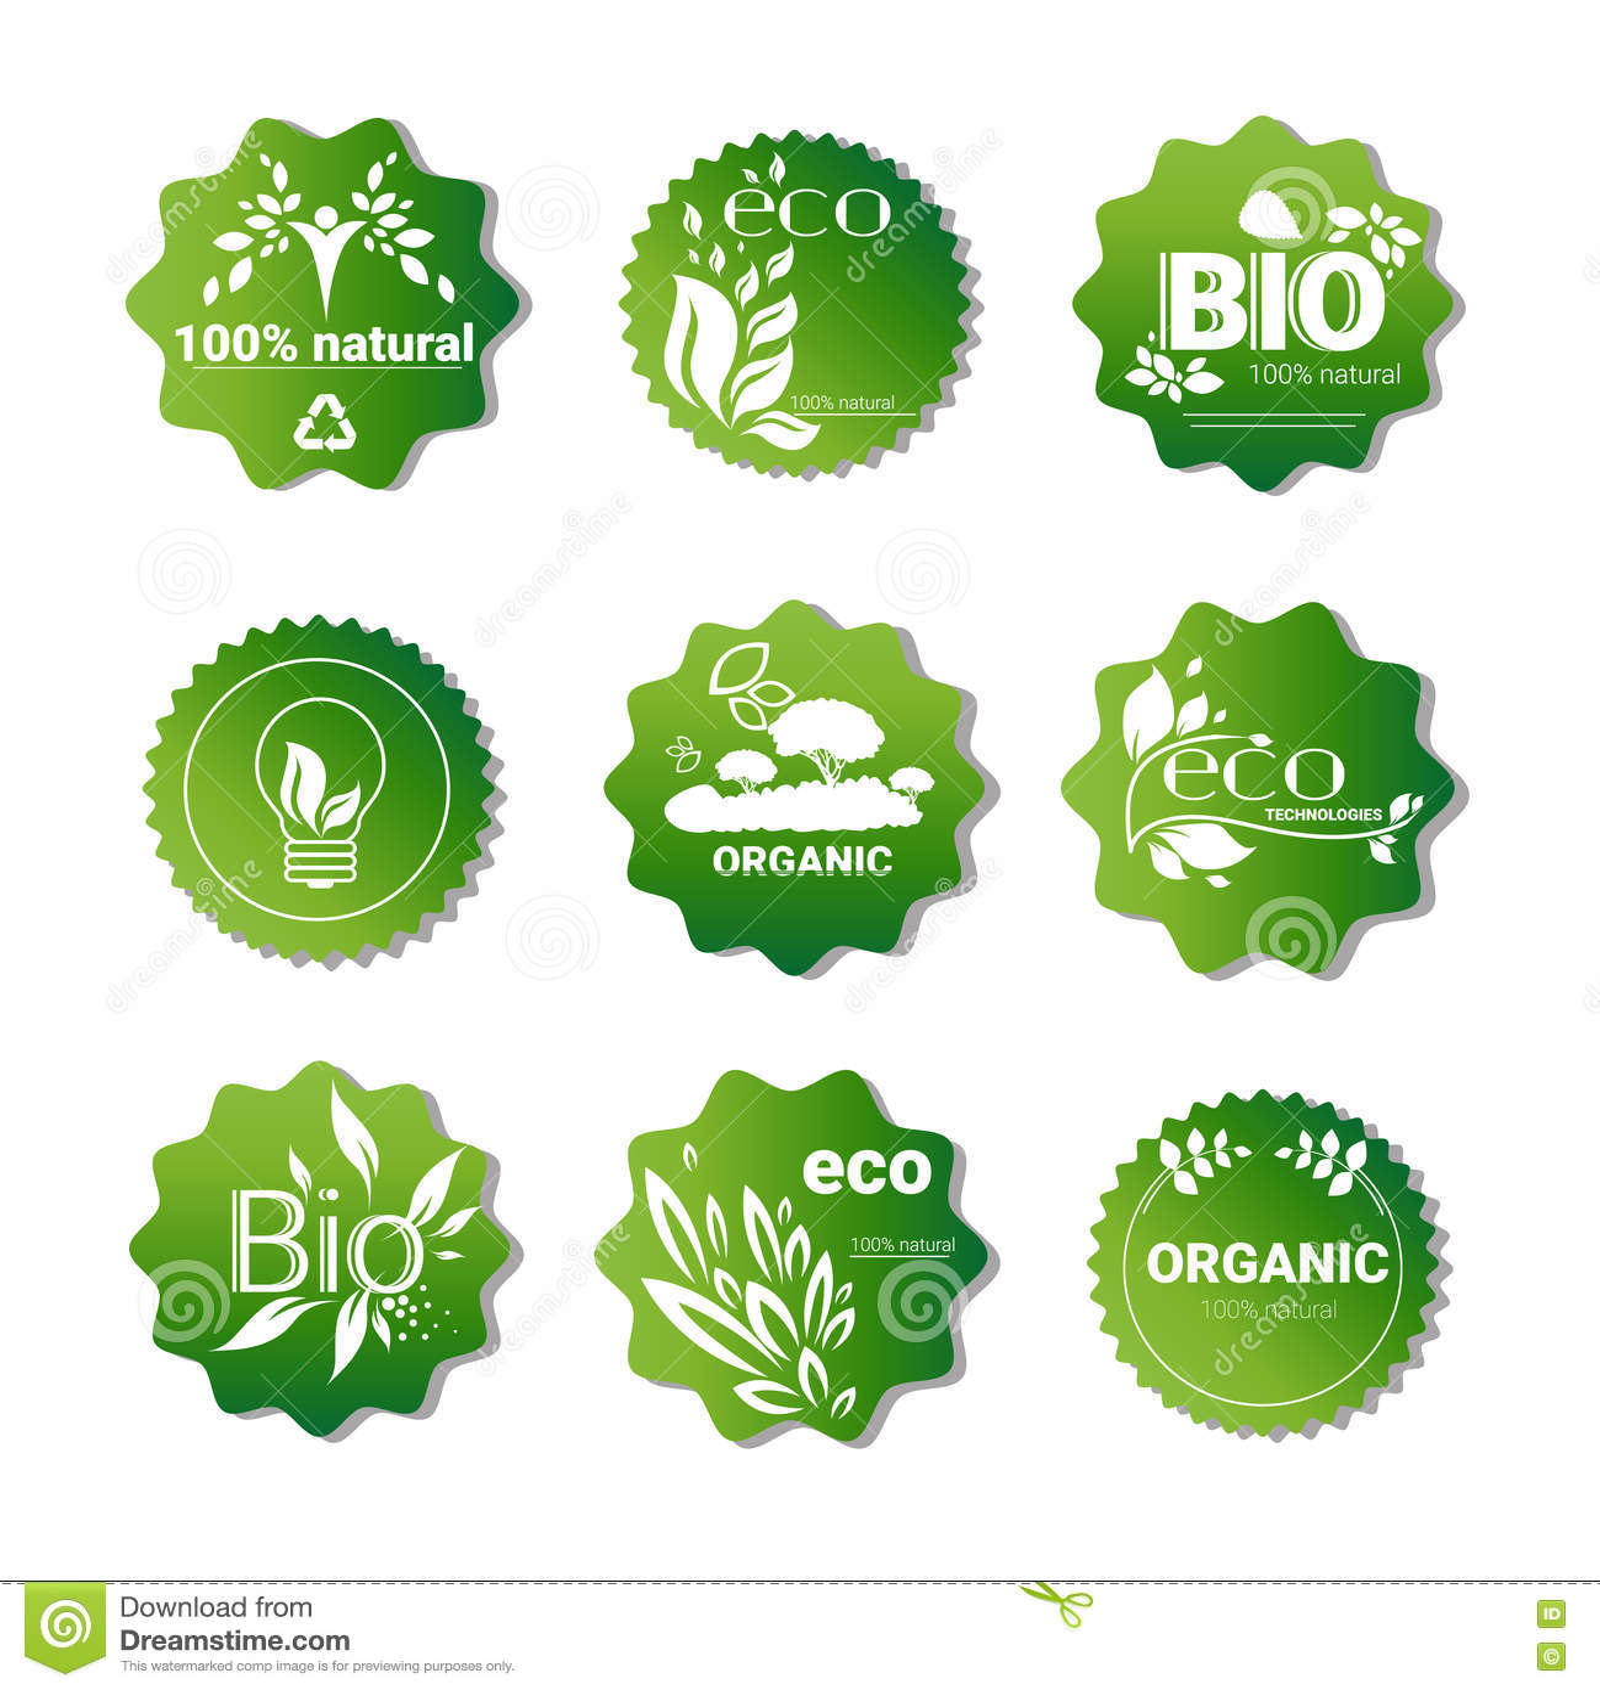 59babb769bc Eco Friendly Organic Natural Product Web Icon Set Green Logo Flat Vector  Illustration